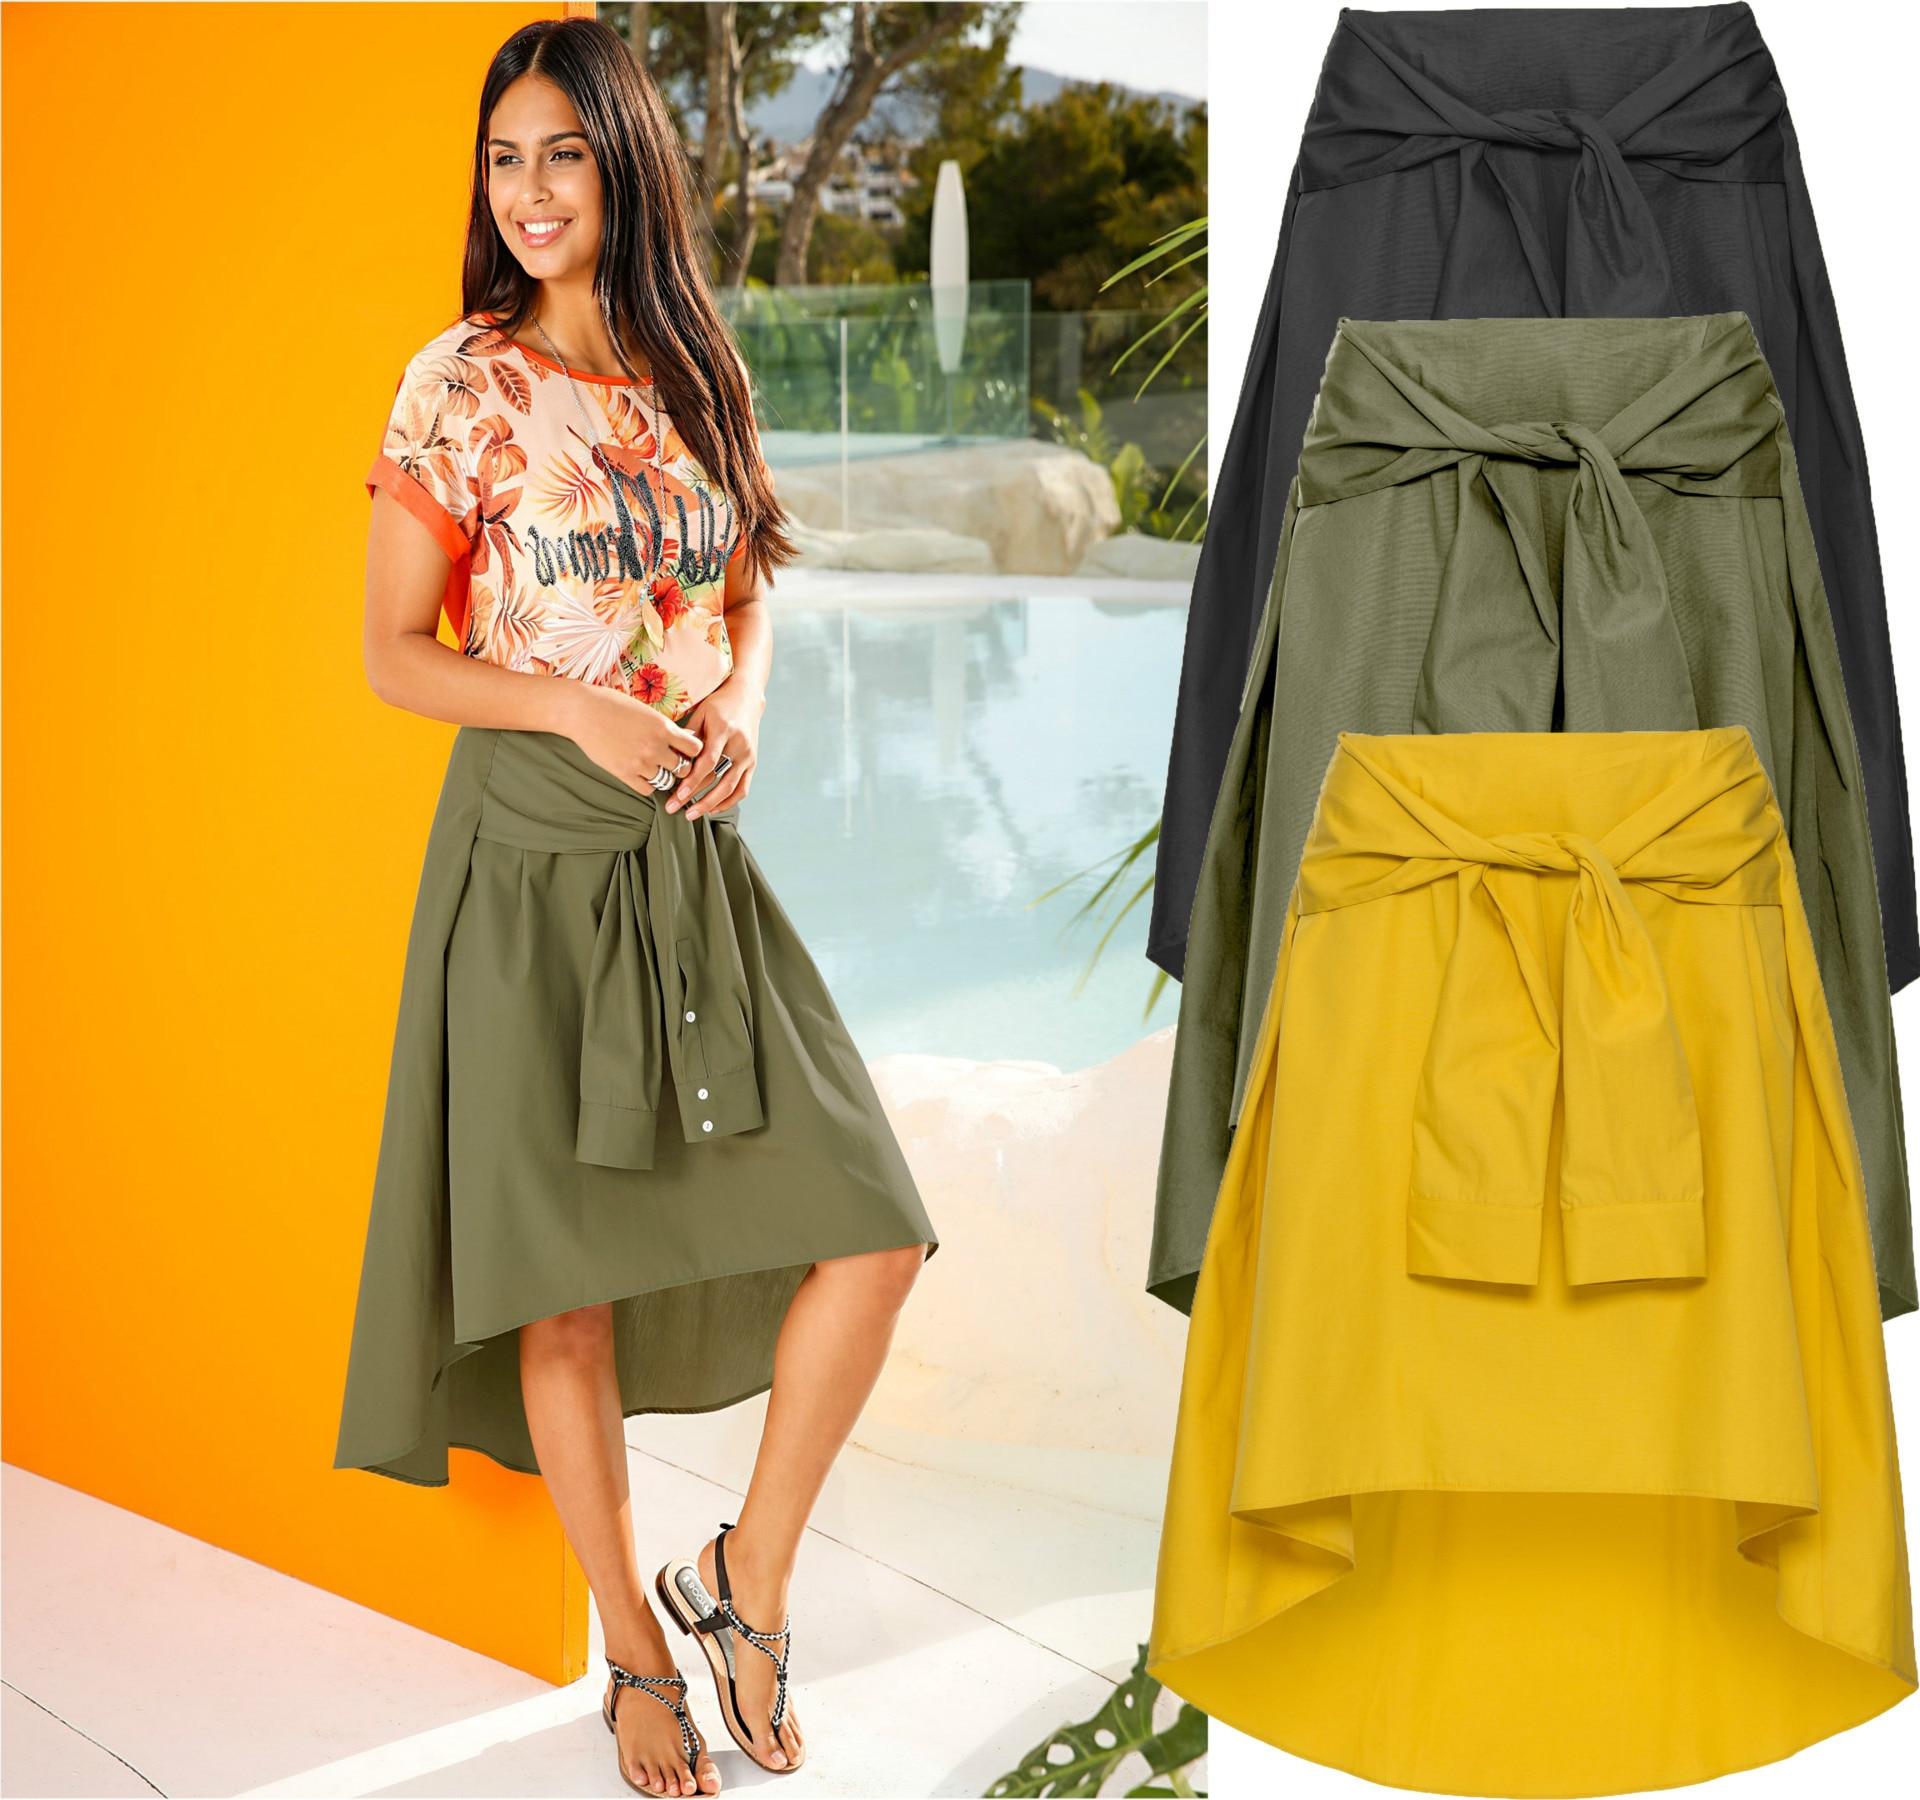 Stylish long skirts exclusive photo